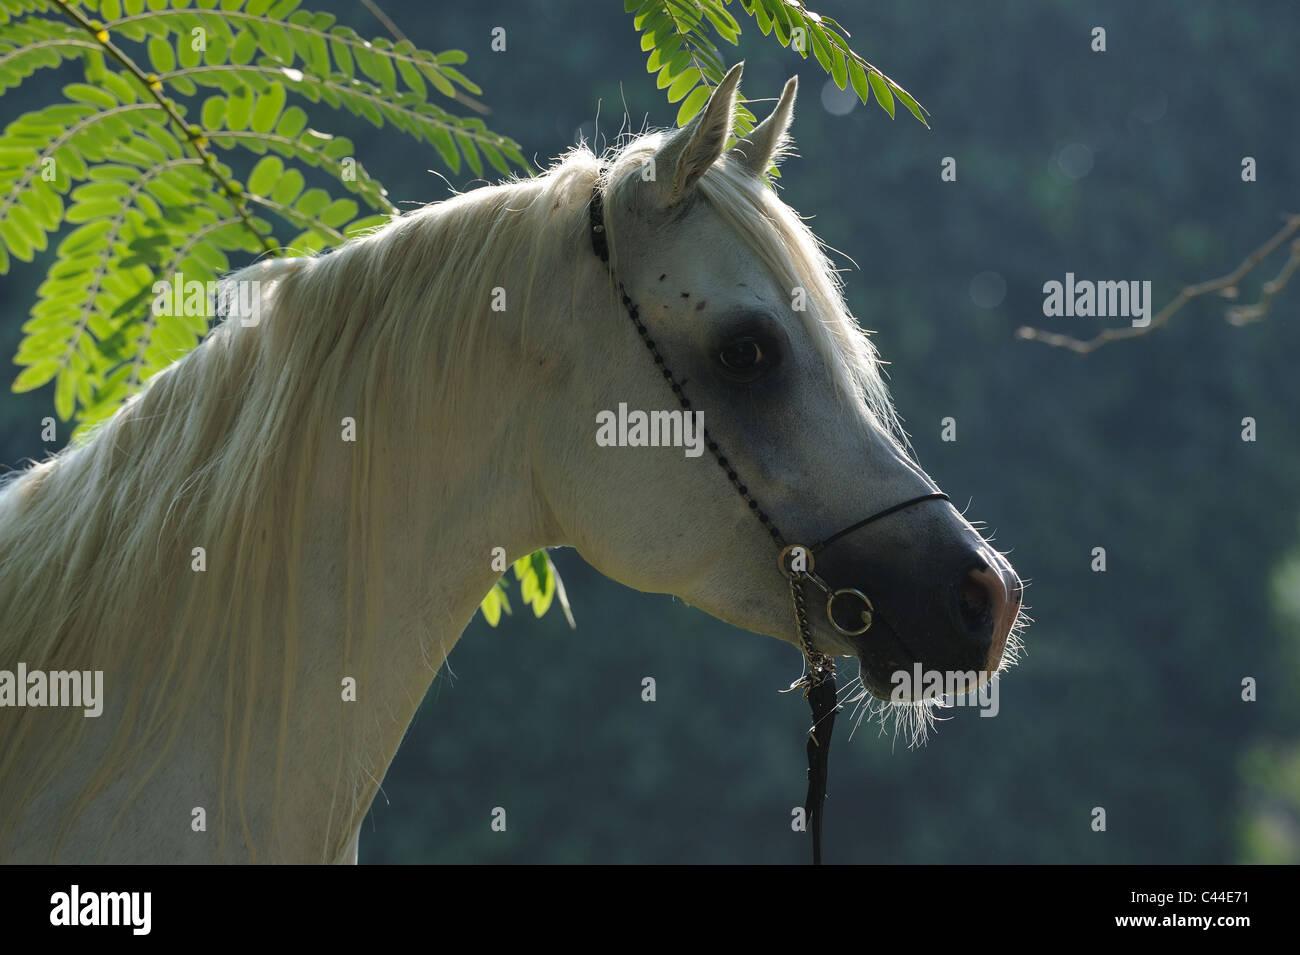 Purebred Arabian Horse (Equus ferus caballus), portrait of a gray stallion. - Stock Image